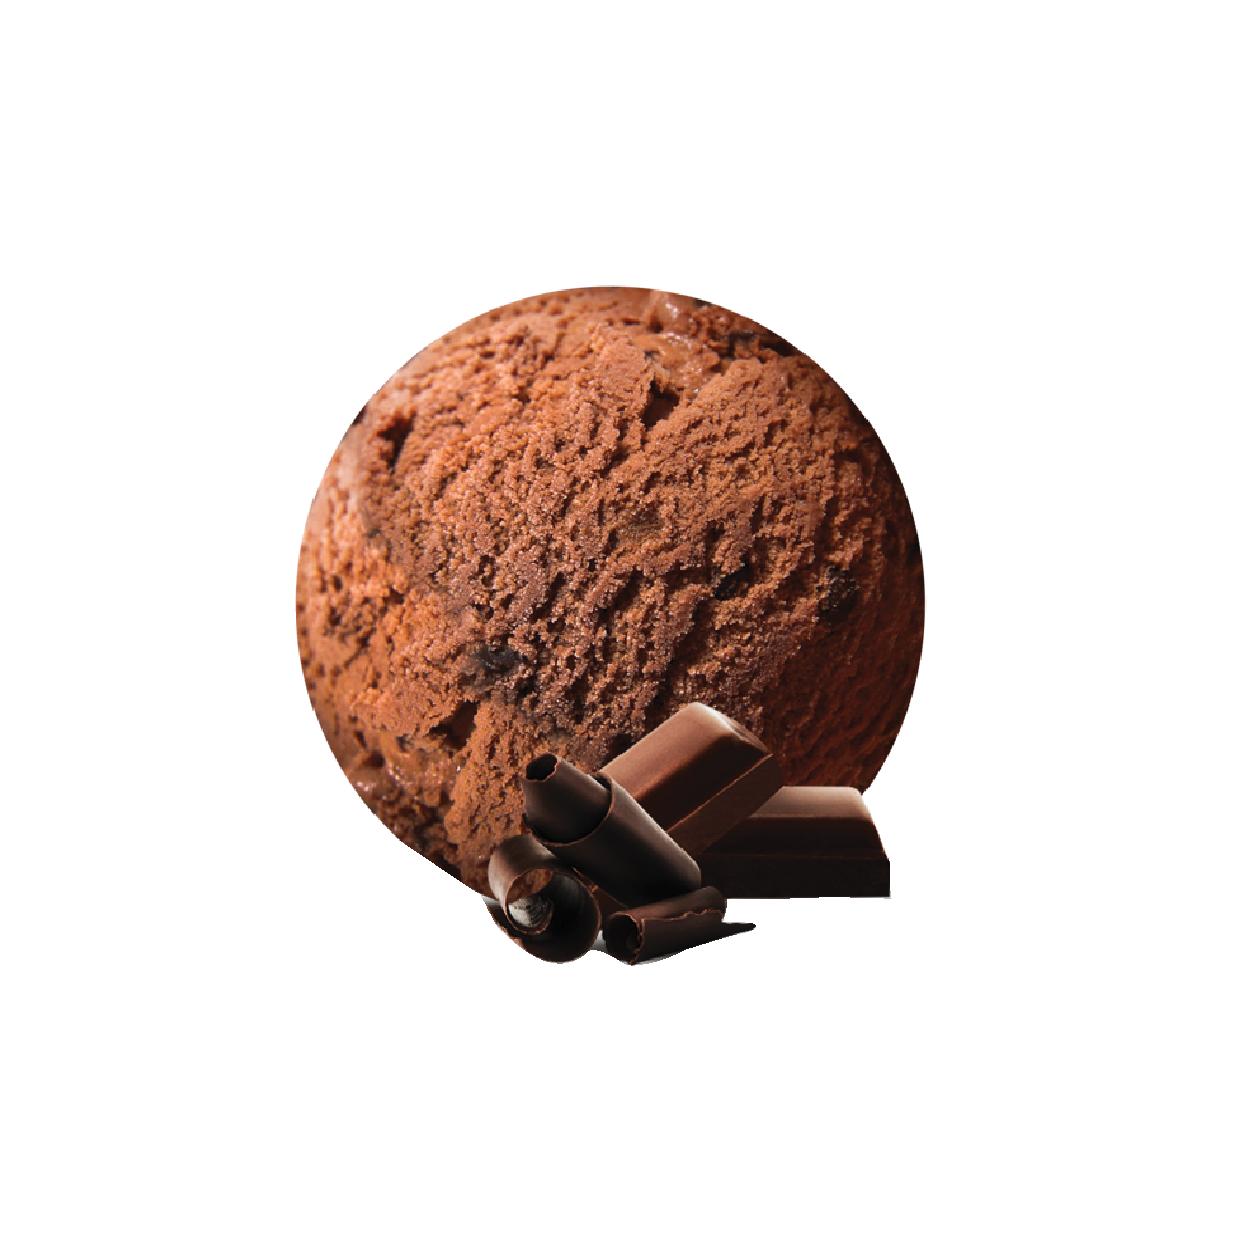 RICH CHOCOLATE